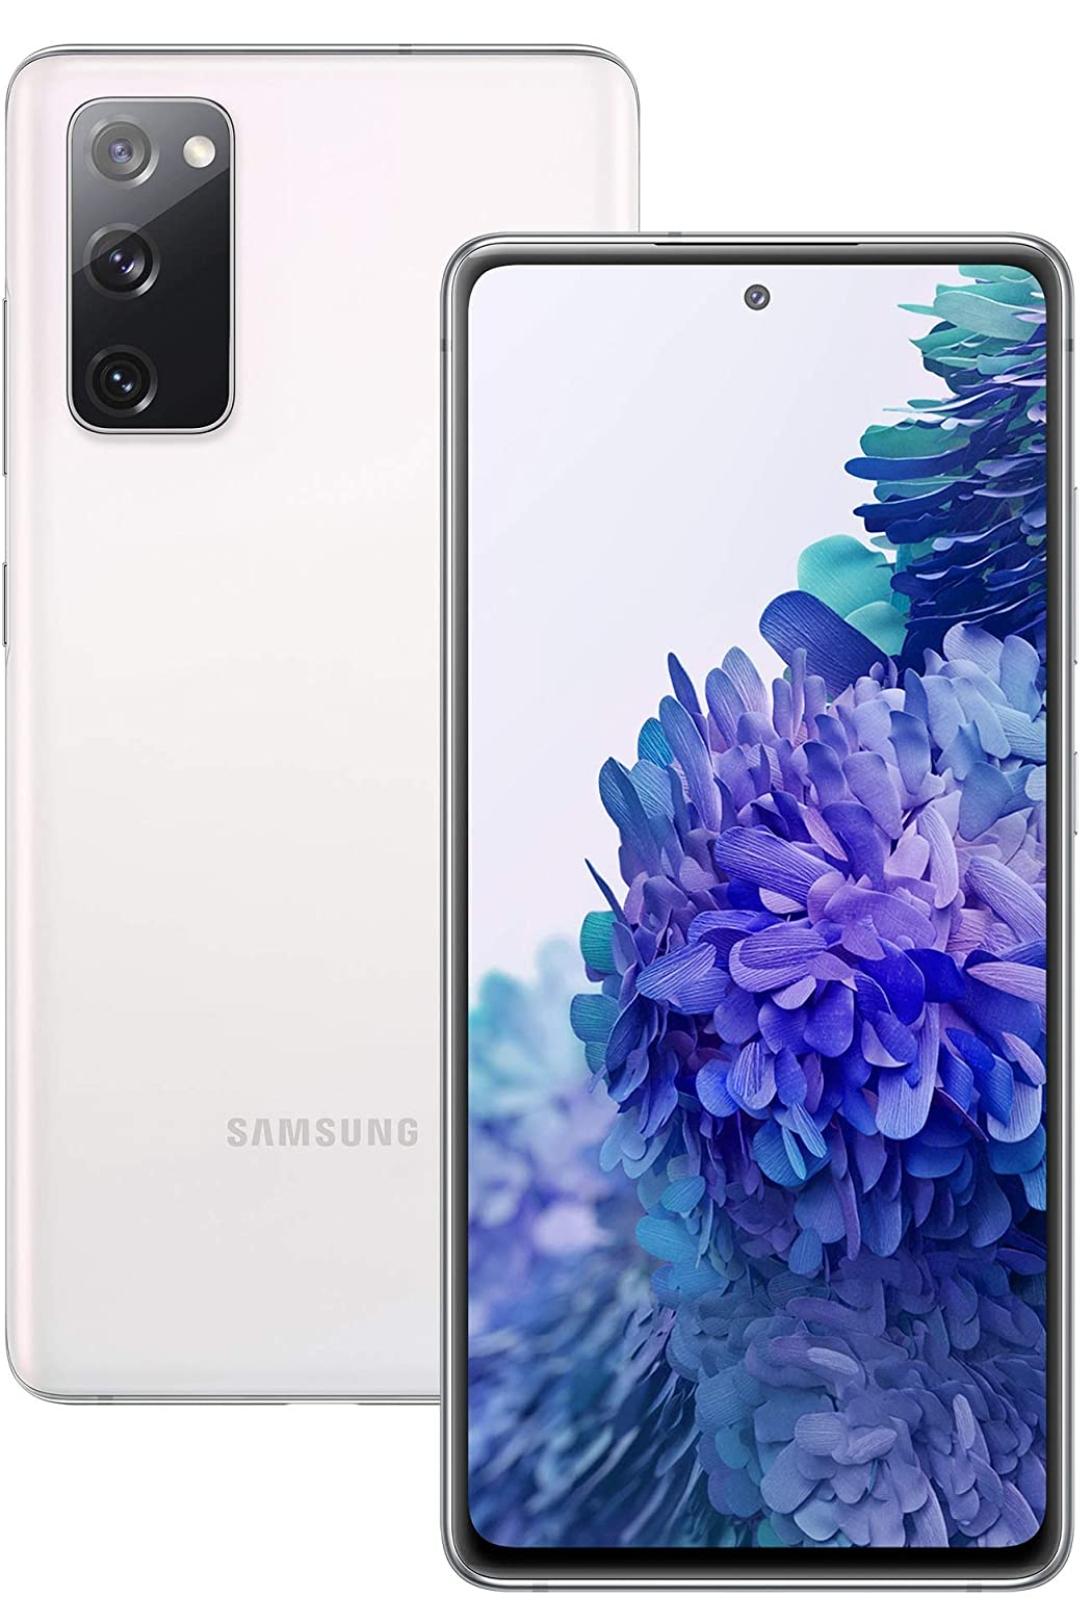 Samsung Galaxy S20 FE Snapdragon 865 Mobile Phone Sim Free Smartphone 256 GB Cloud White (UK Version) - £497.78 @ Amazon